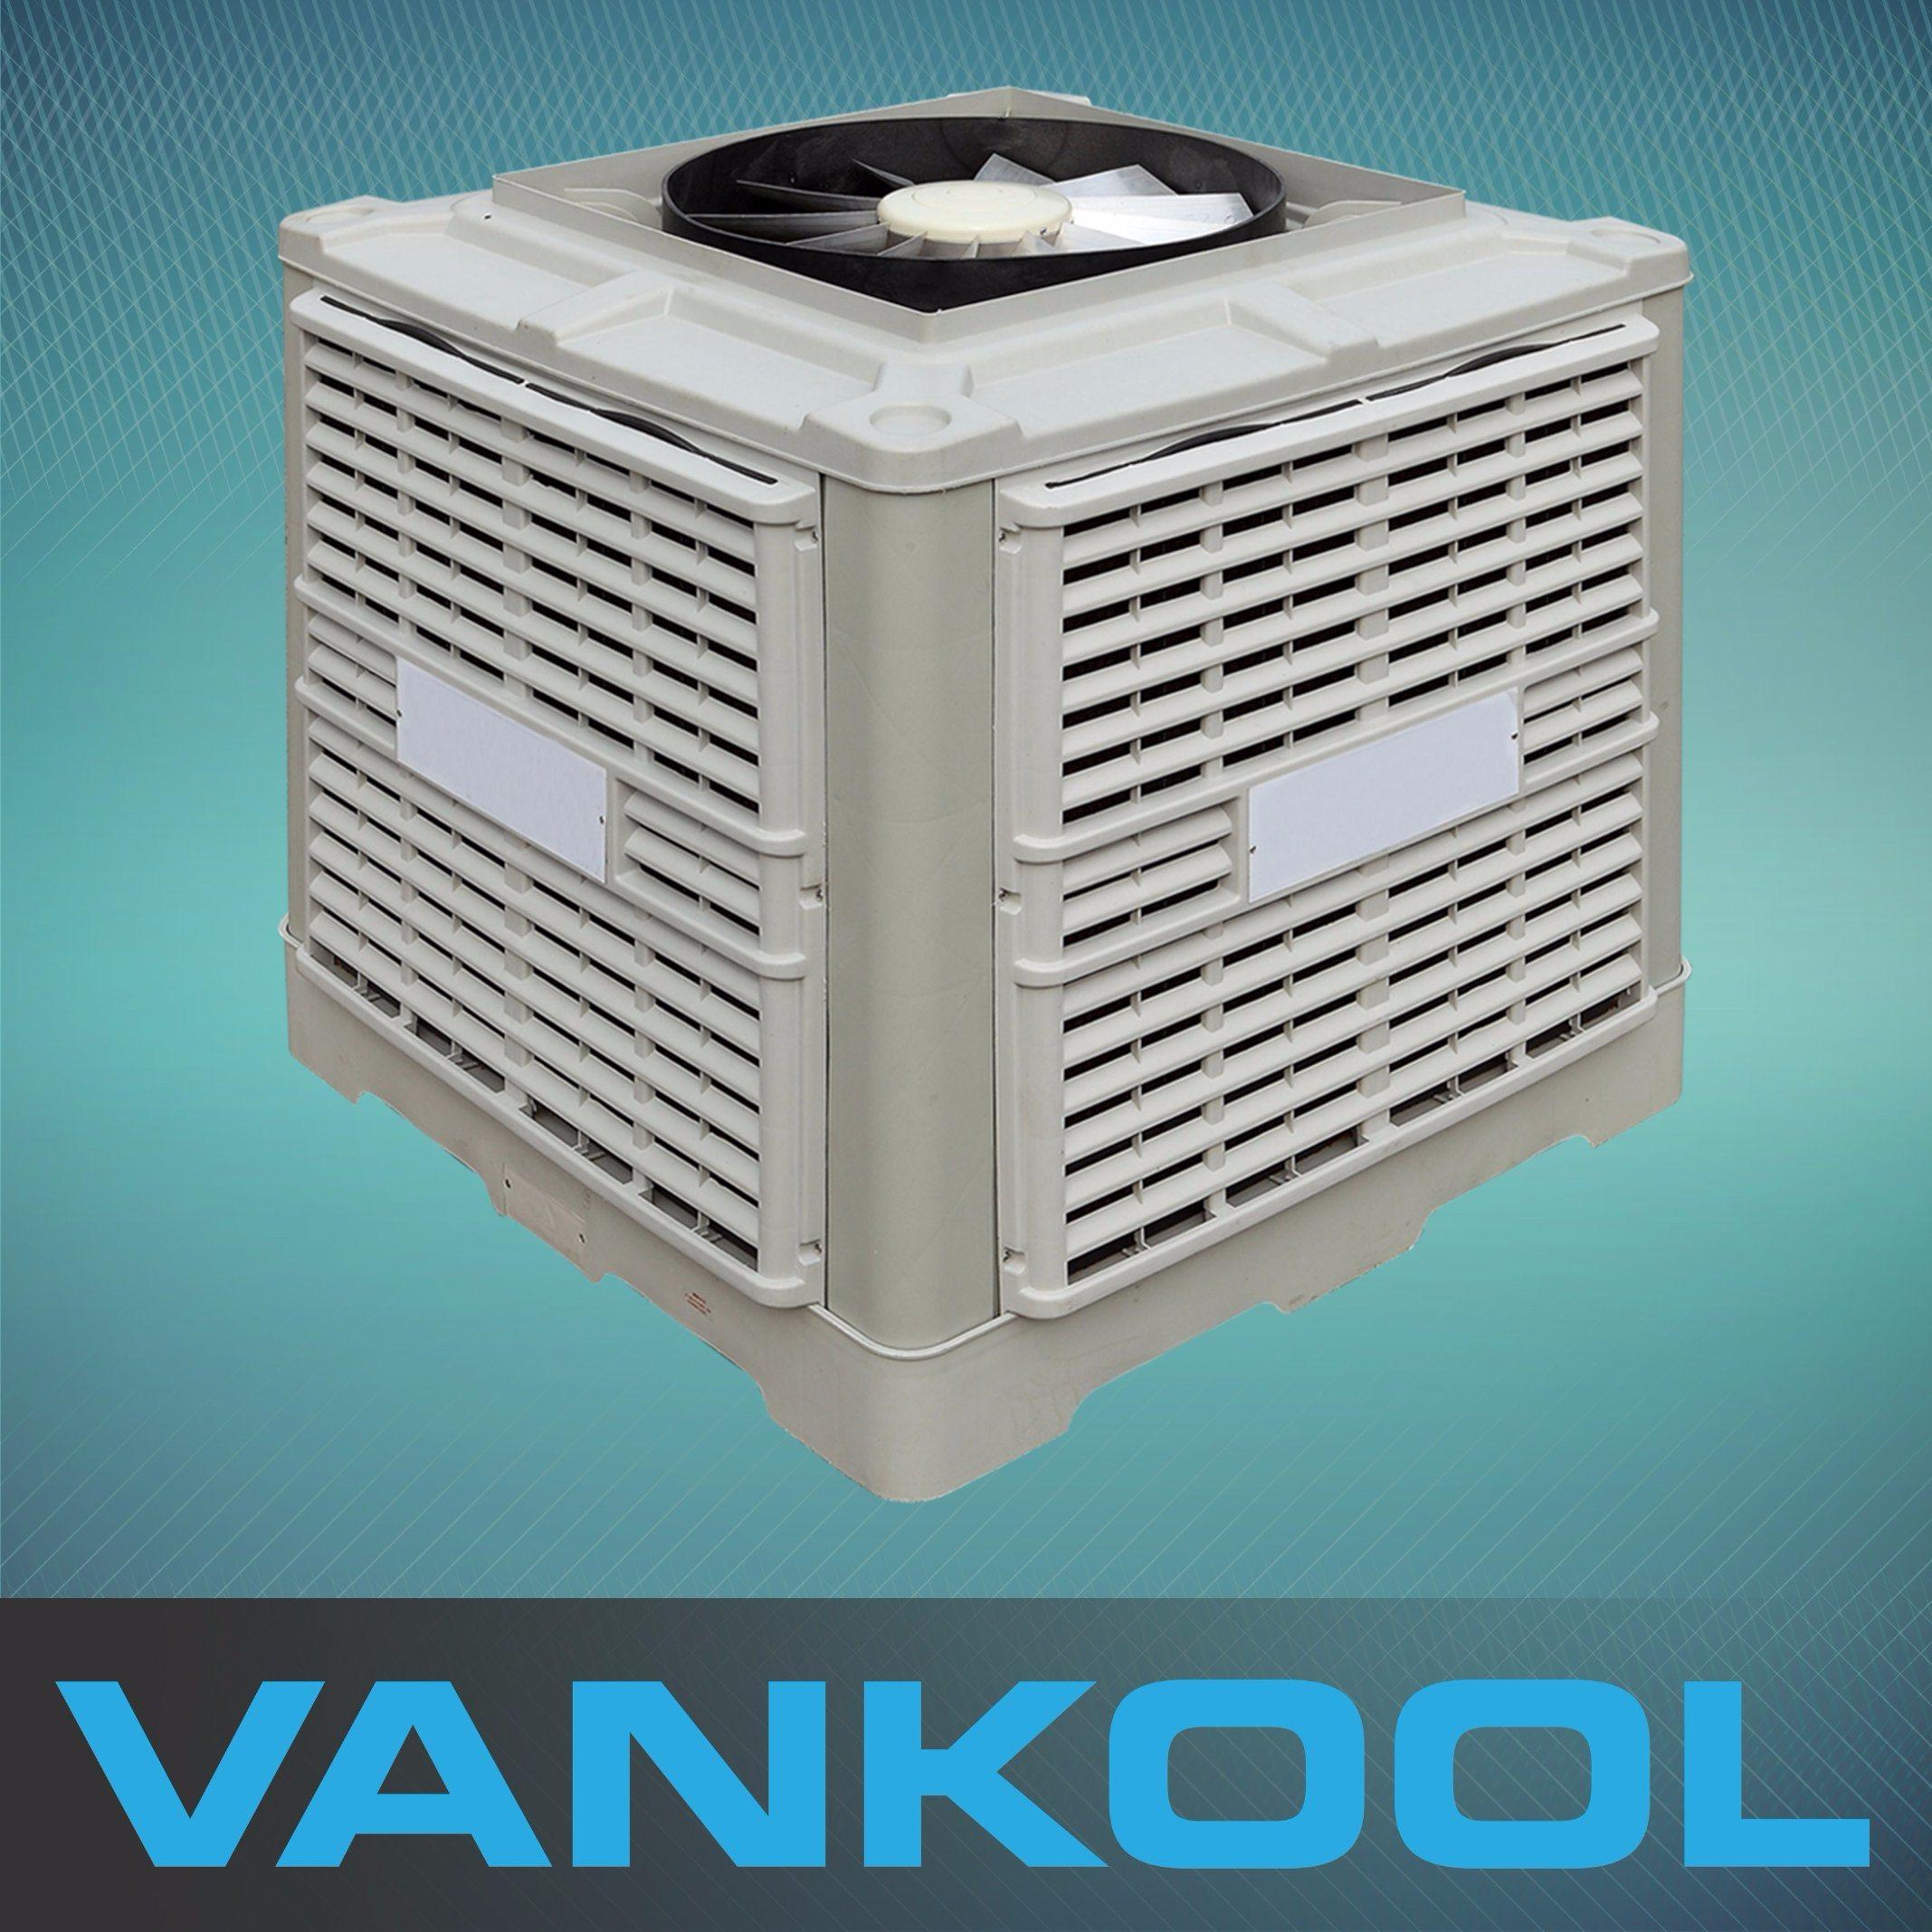 Industrial Value Evaporative Air Cooler Top Vent Air Conditioner